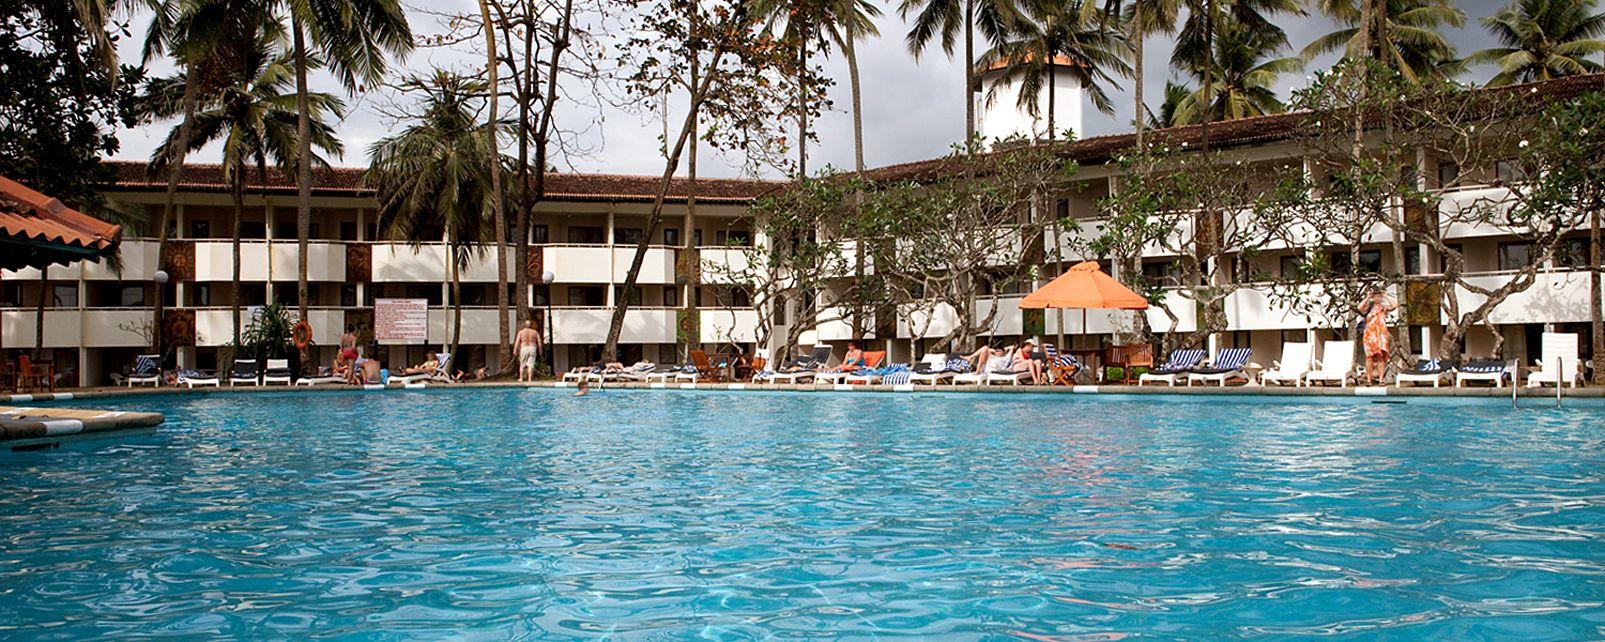 Hôtel Tangerine Beach Hotel Kalutara